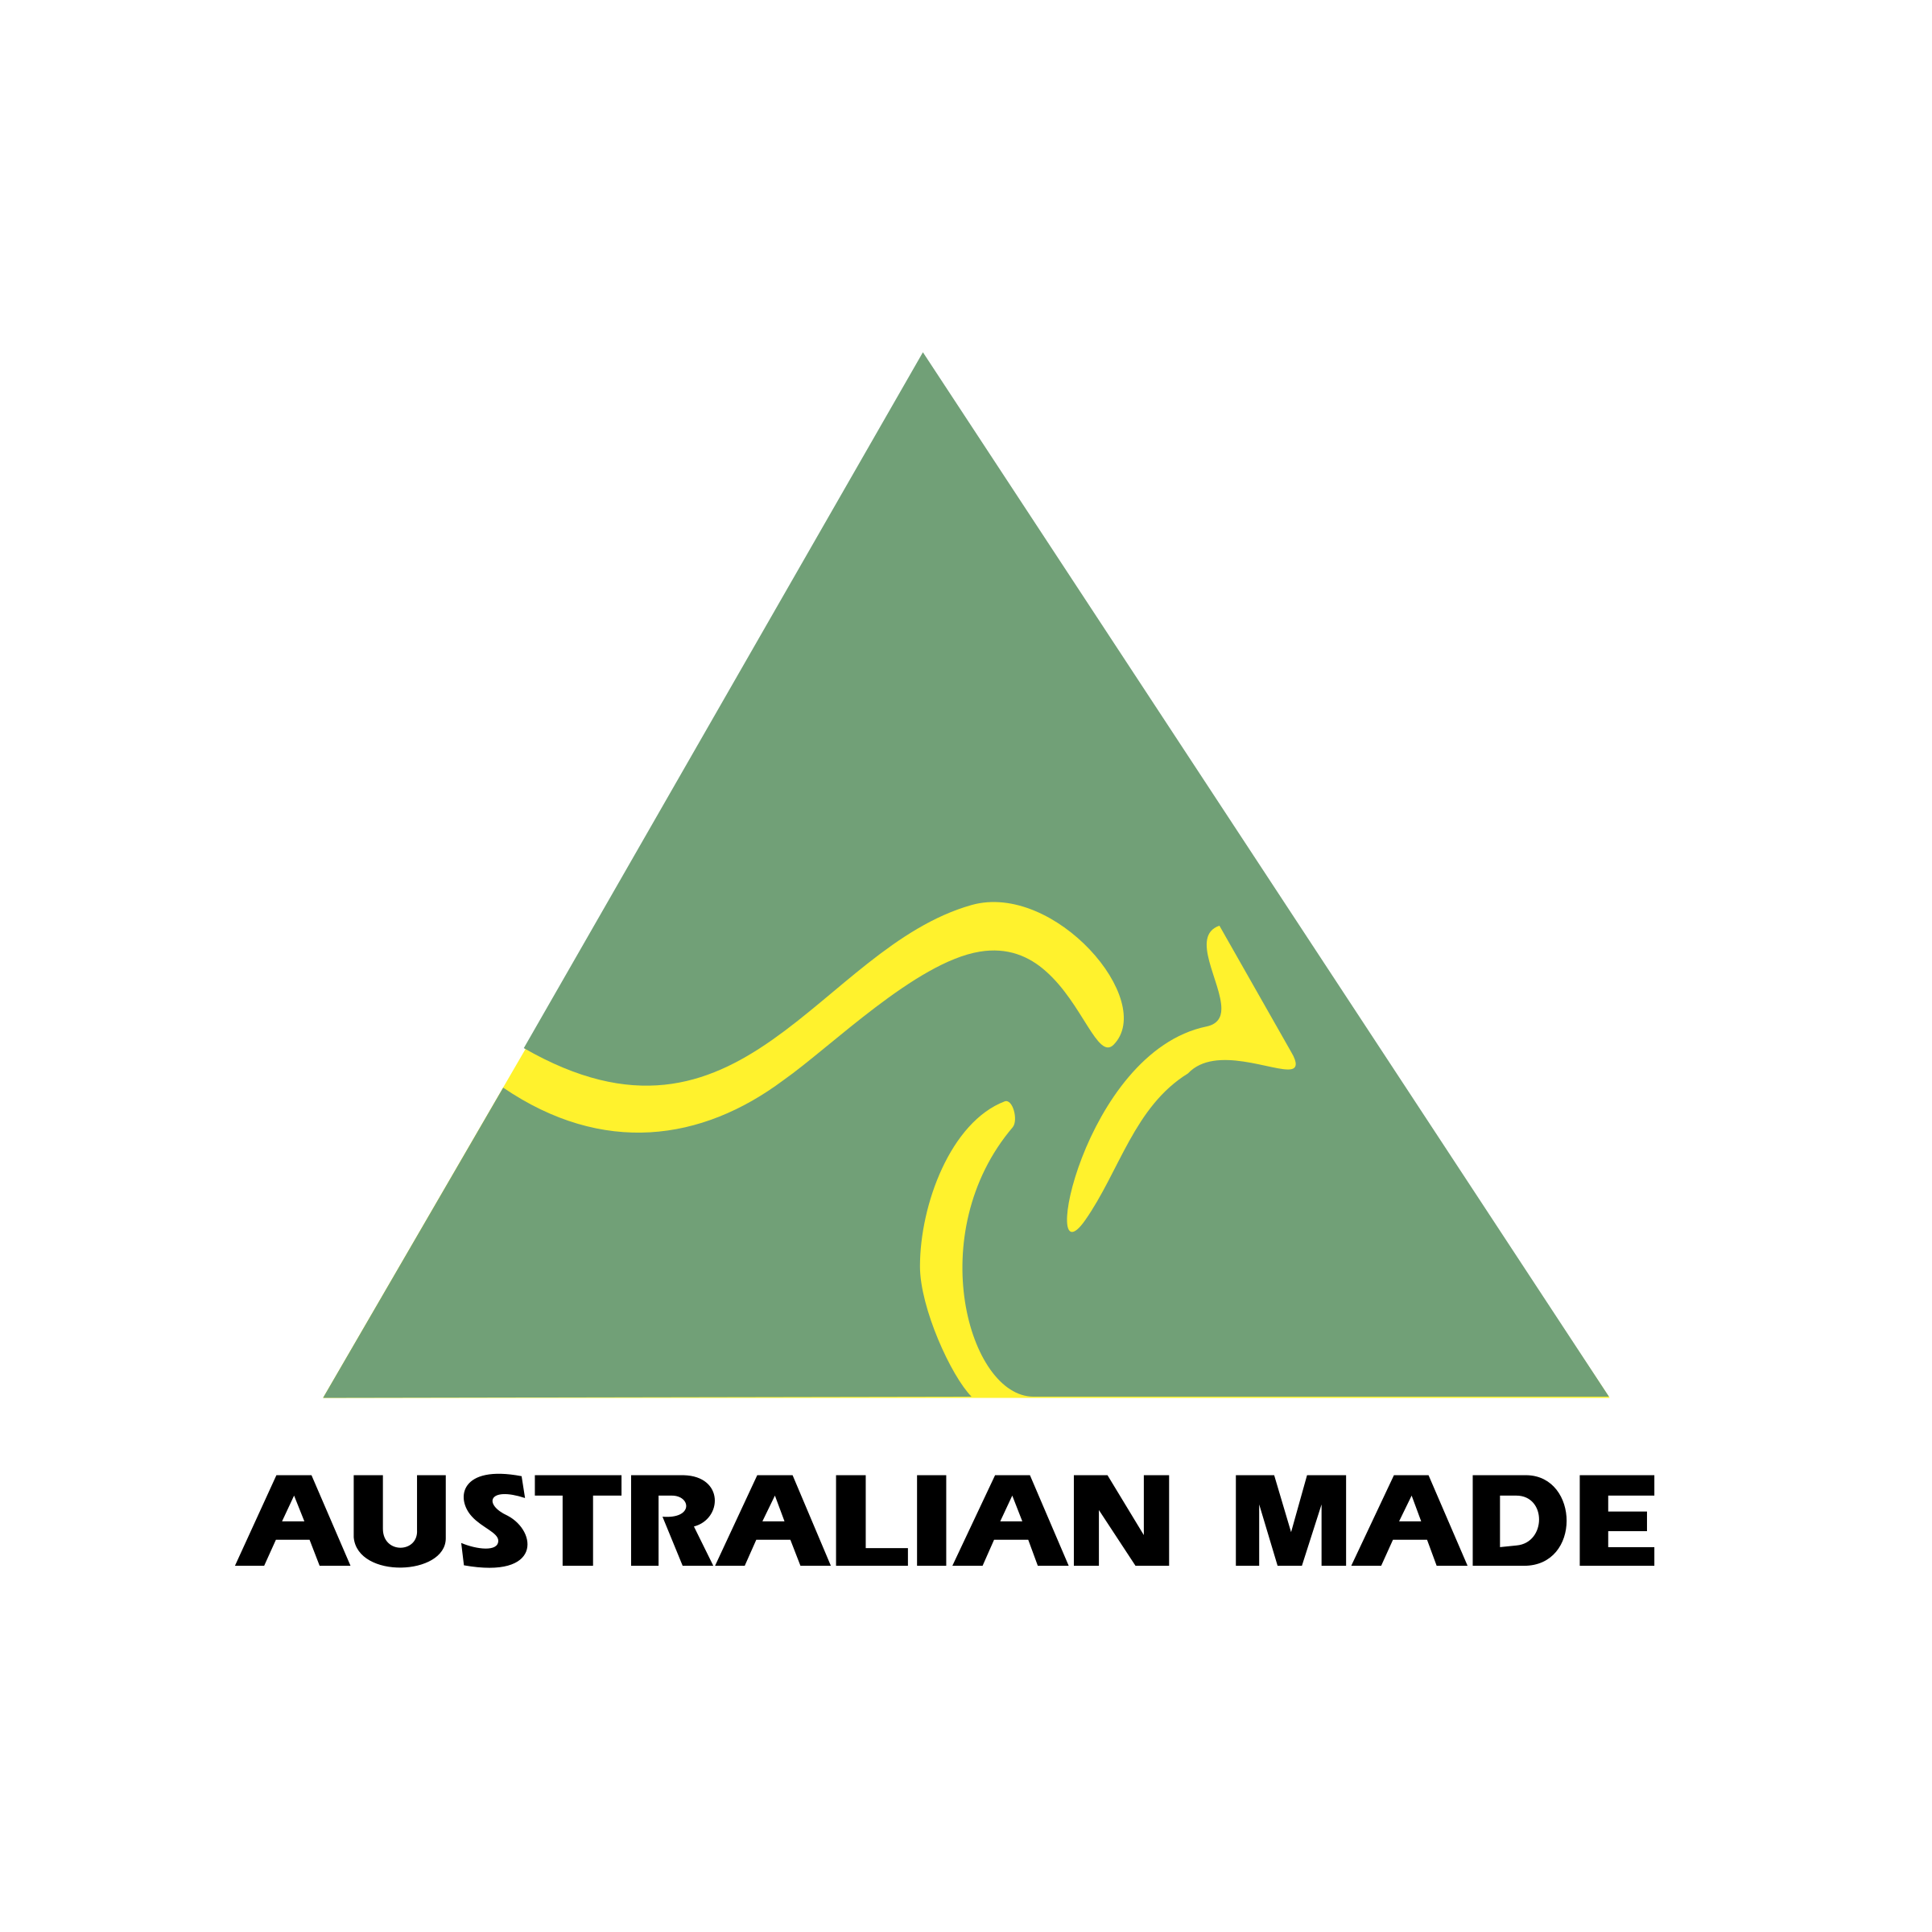 Australian Made Logo PNG Transparent & SVG Vector.